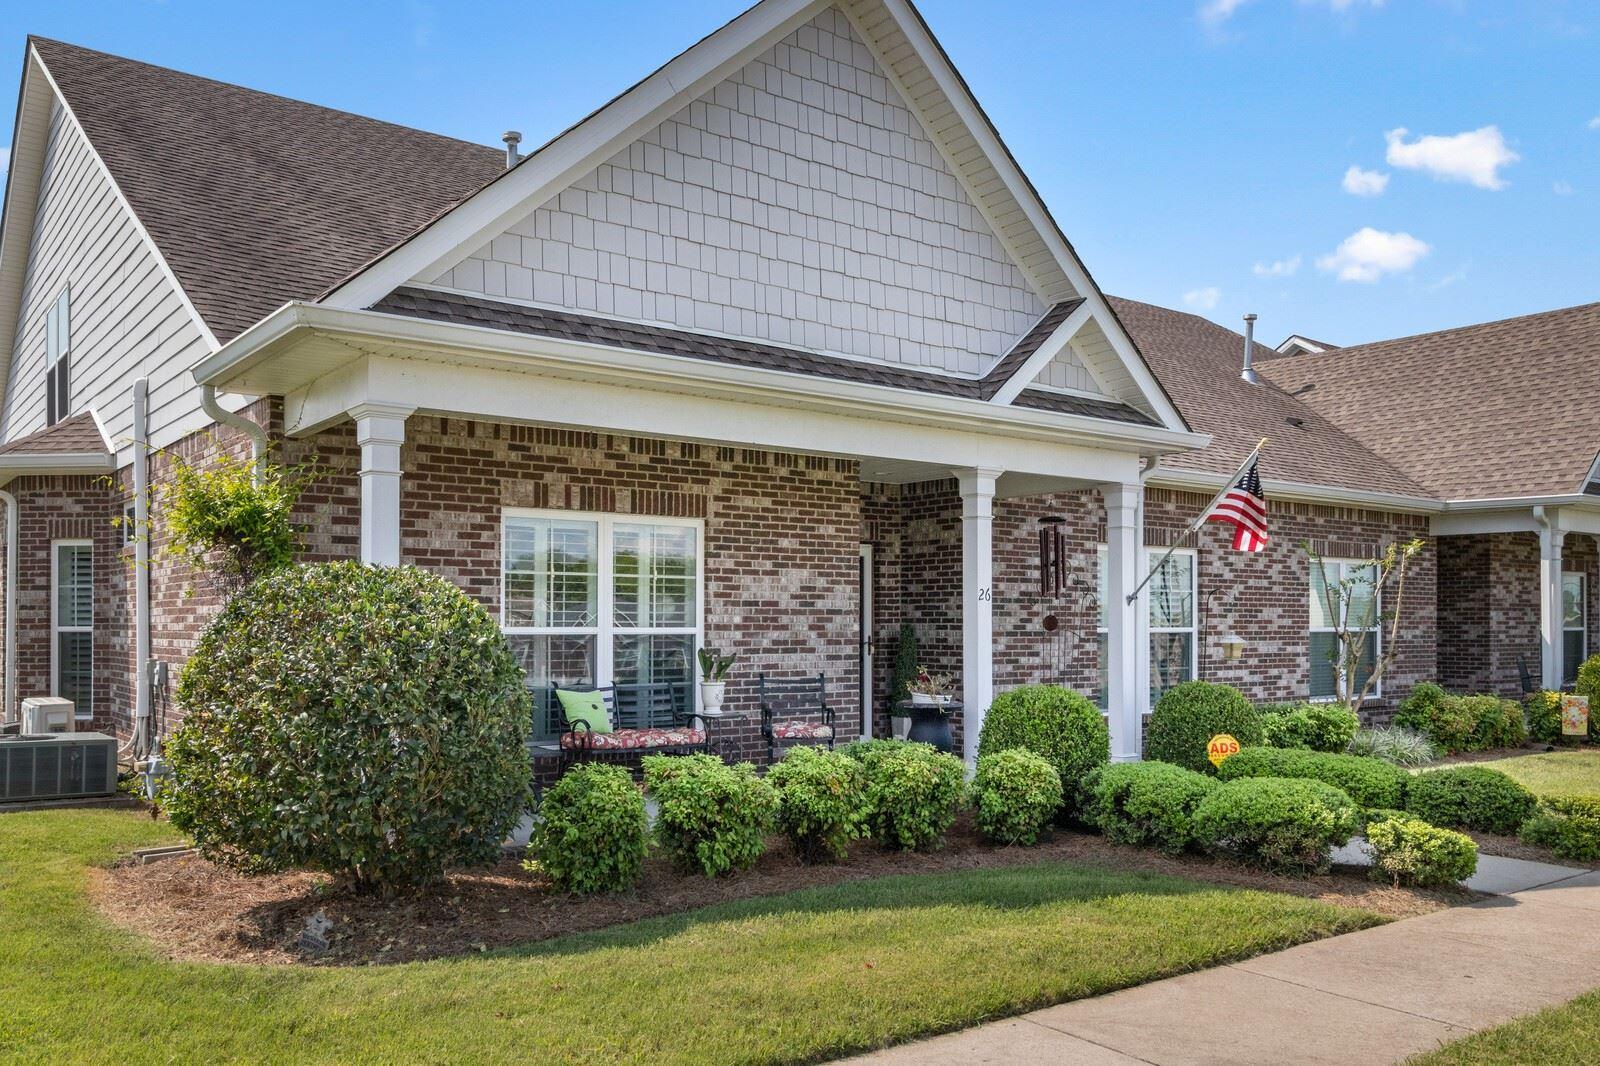 456 Pond Apple Rd #26, Clarksville, TN 37043 - MLS#: 2187119